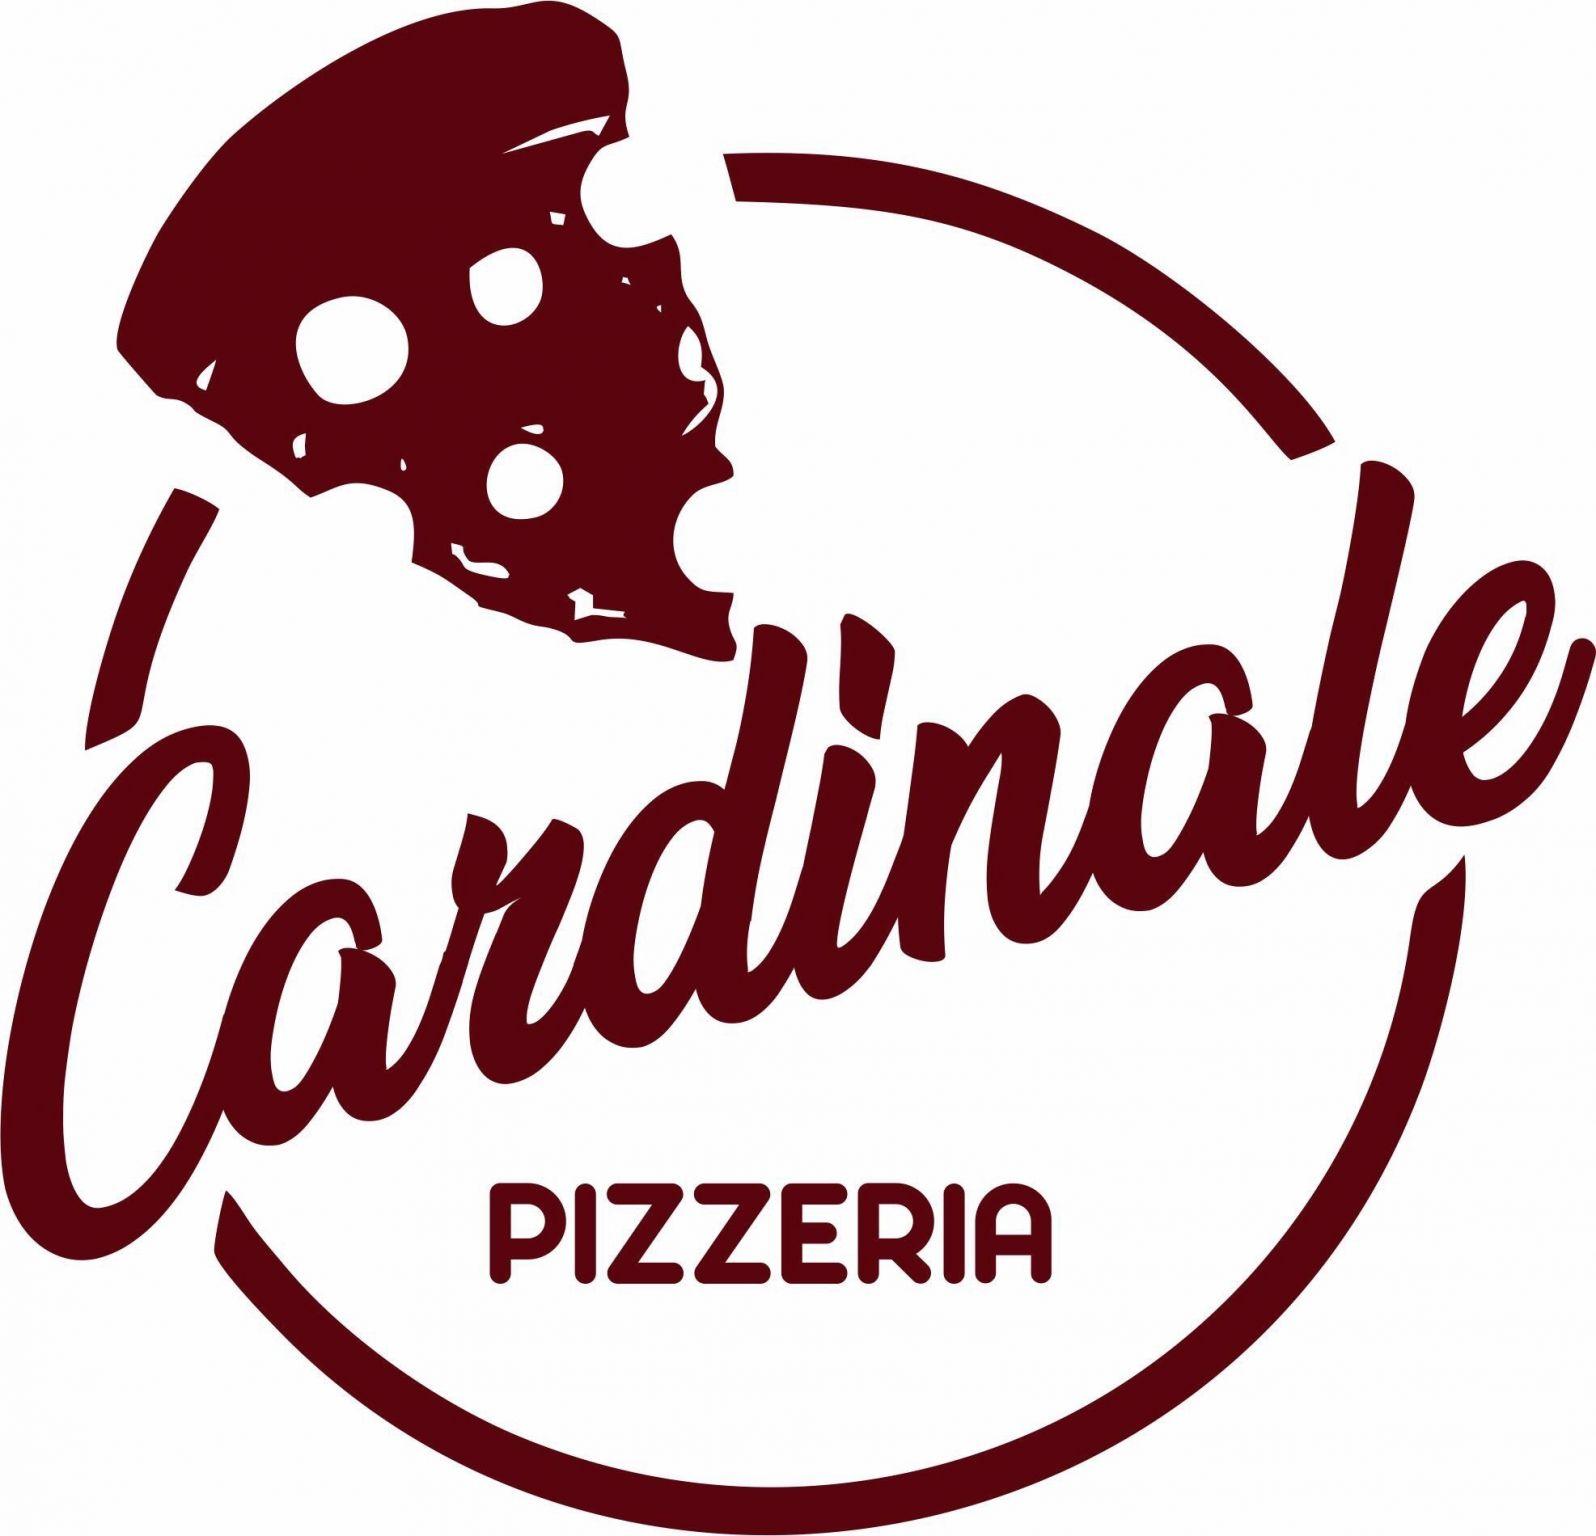 Pizzaria Cardinale